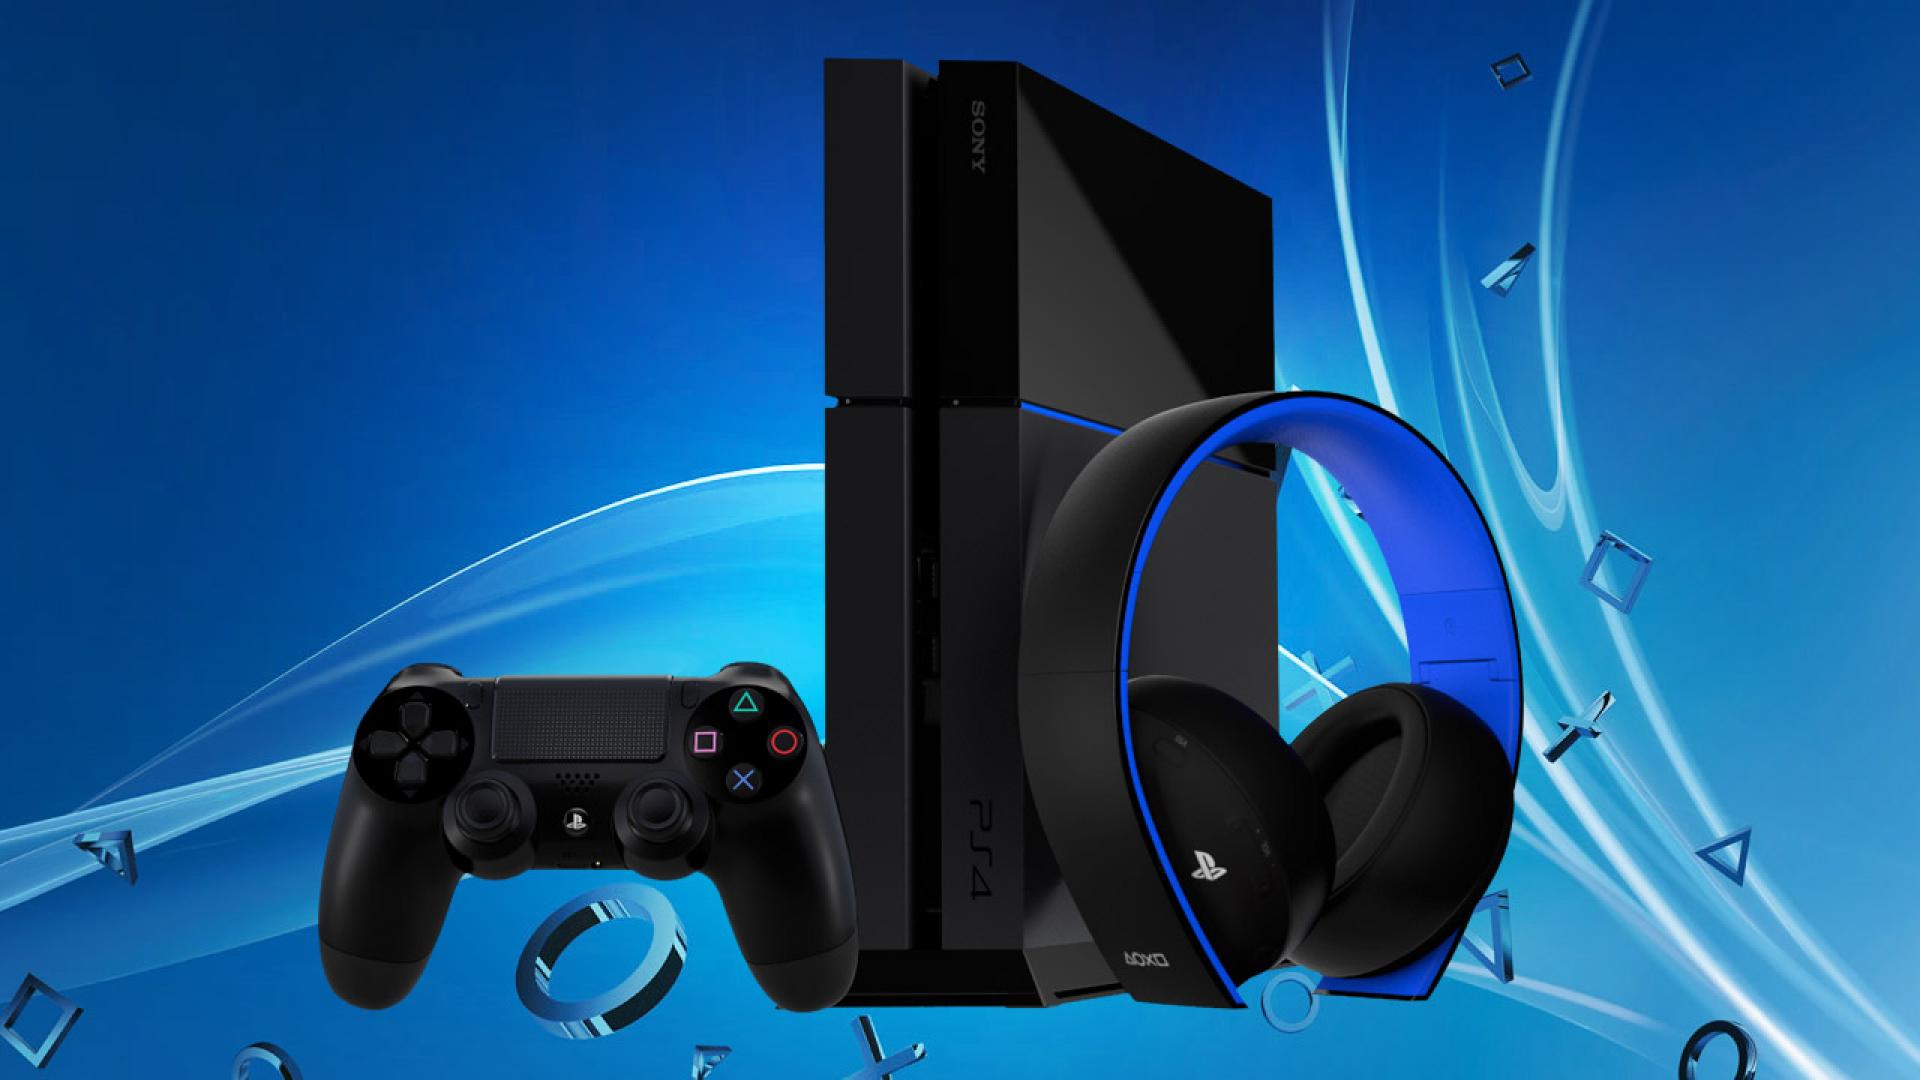 Baixa Papel De Parede Ps3: Playstation 4 Full HD Papel De Parede And Background Image